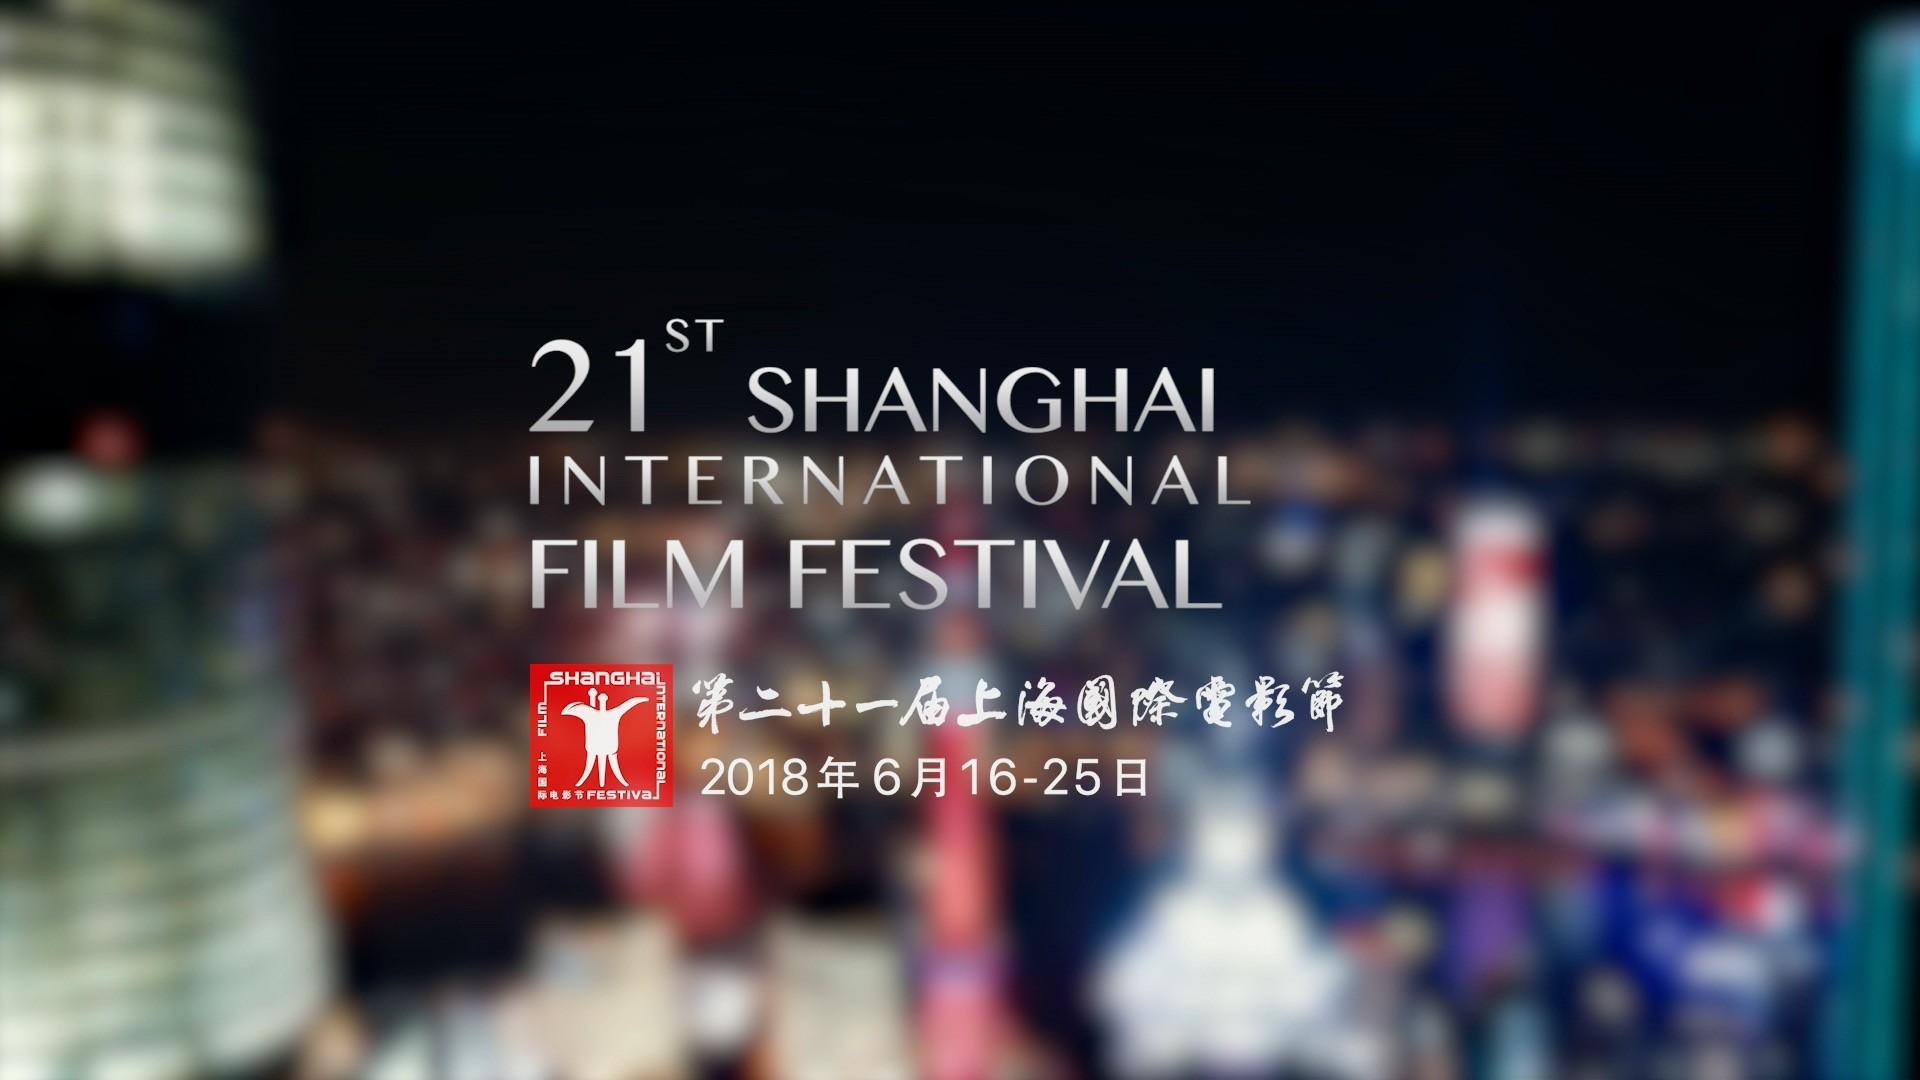 sangay uluslararasi film festivali seyrederiz 1